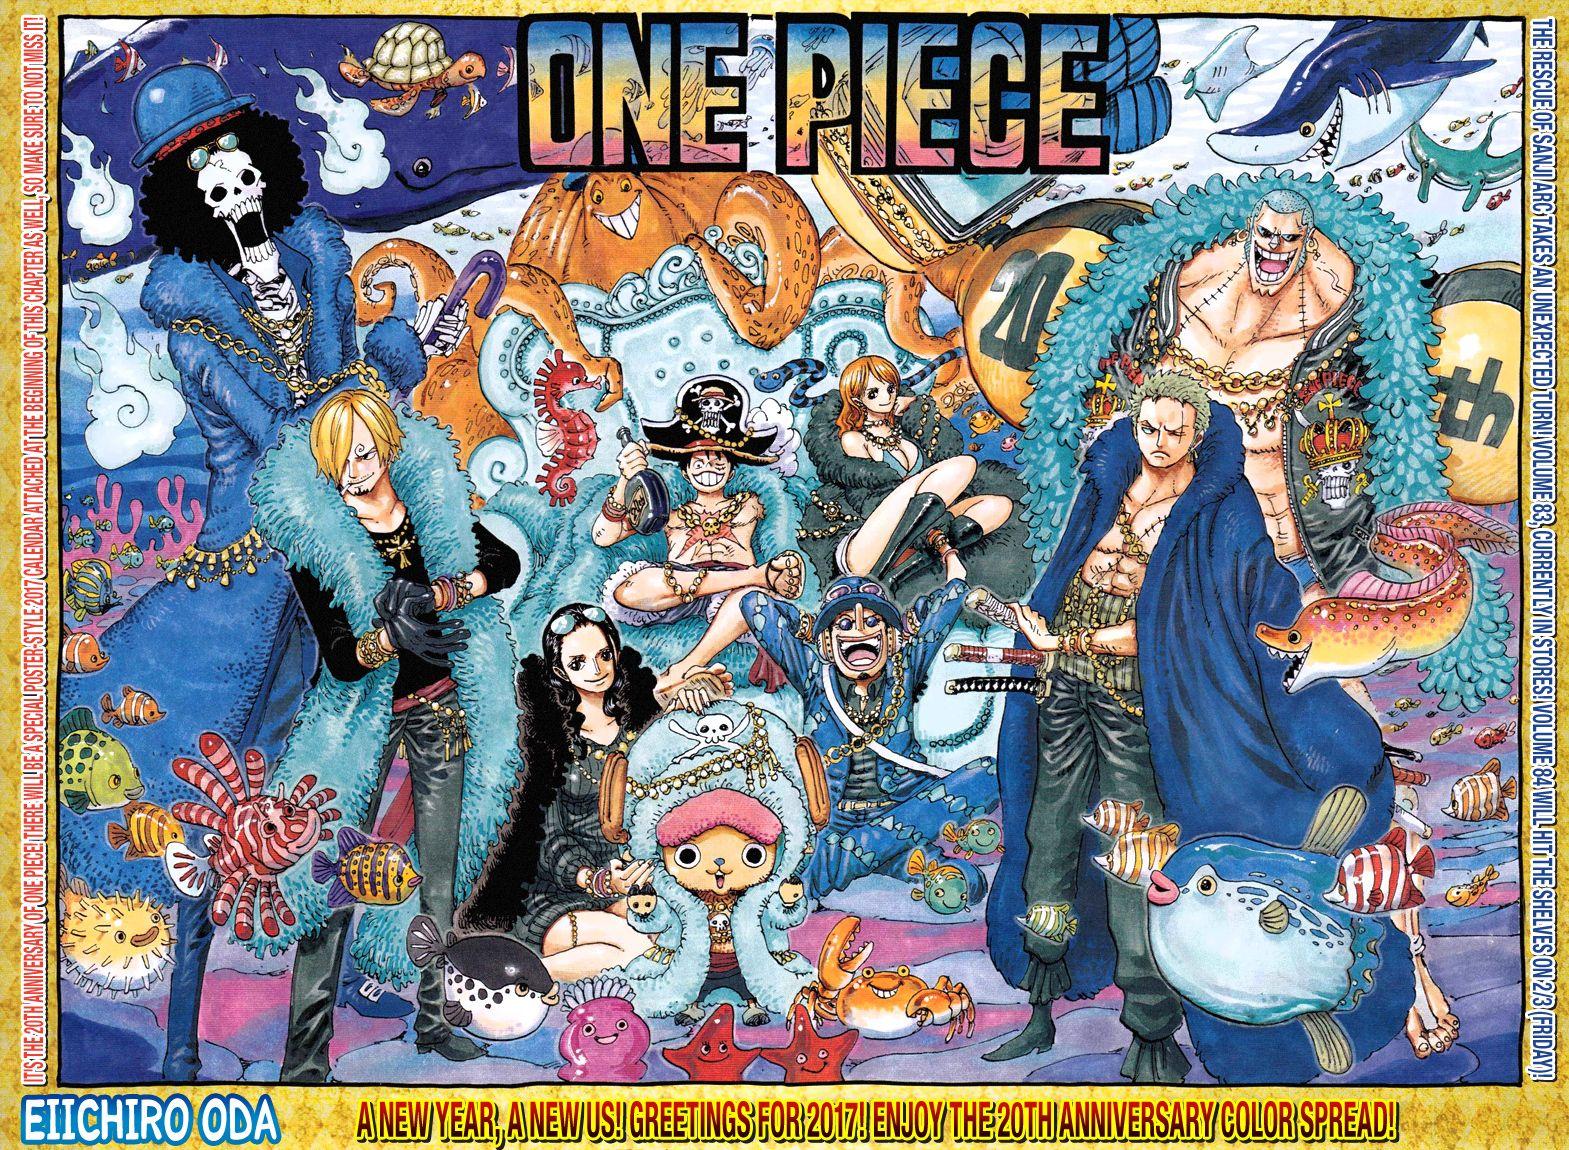 Anime & Manga / Ship Tease - TV Tropes